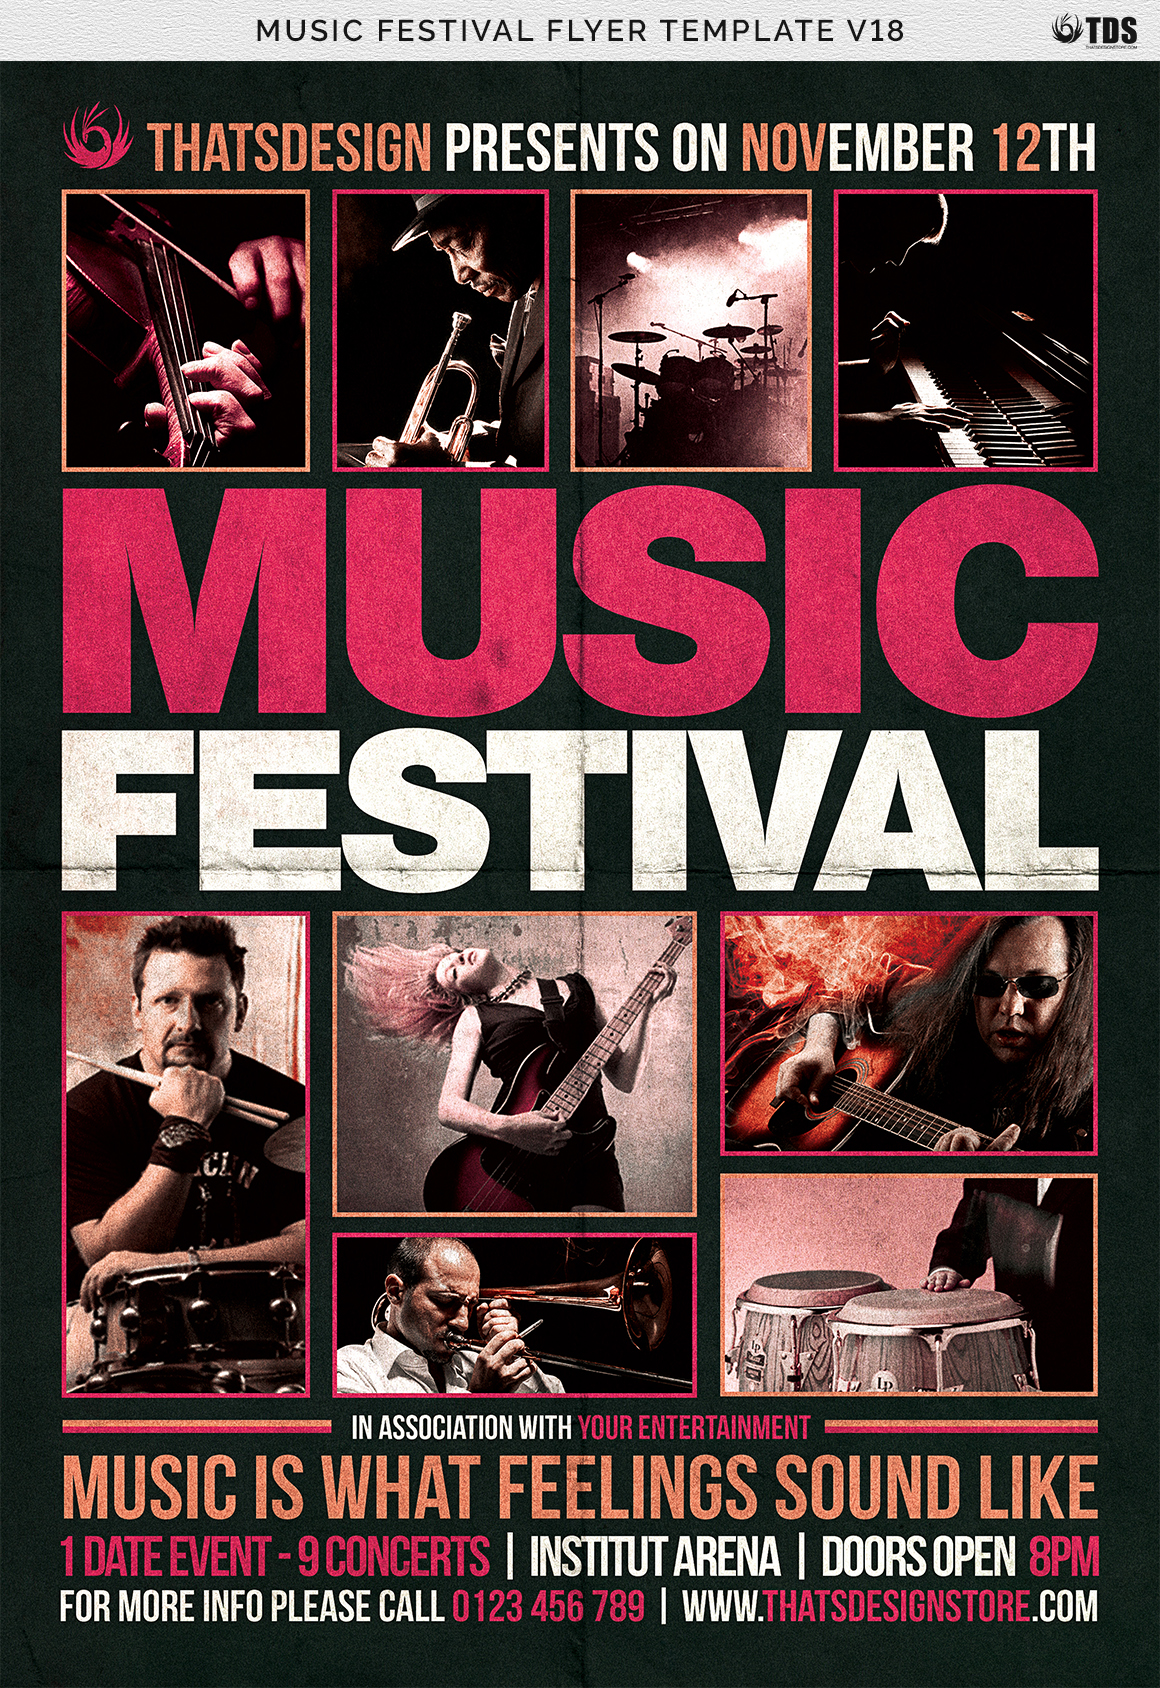 Music Festival Flyer Template V18 example image 7